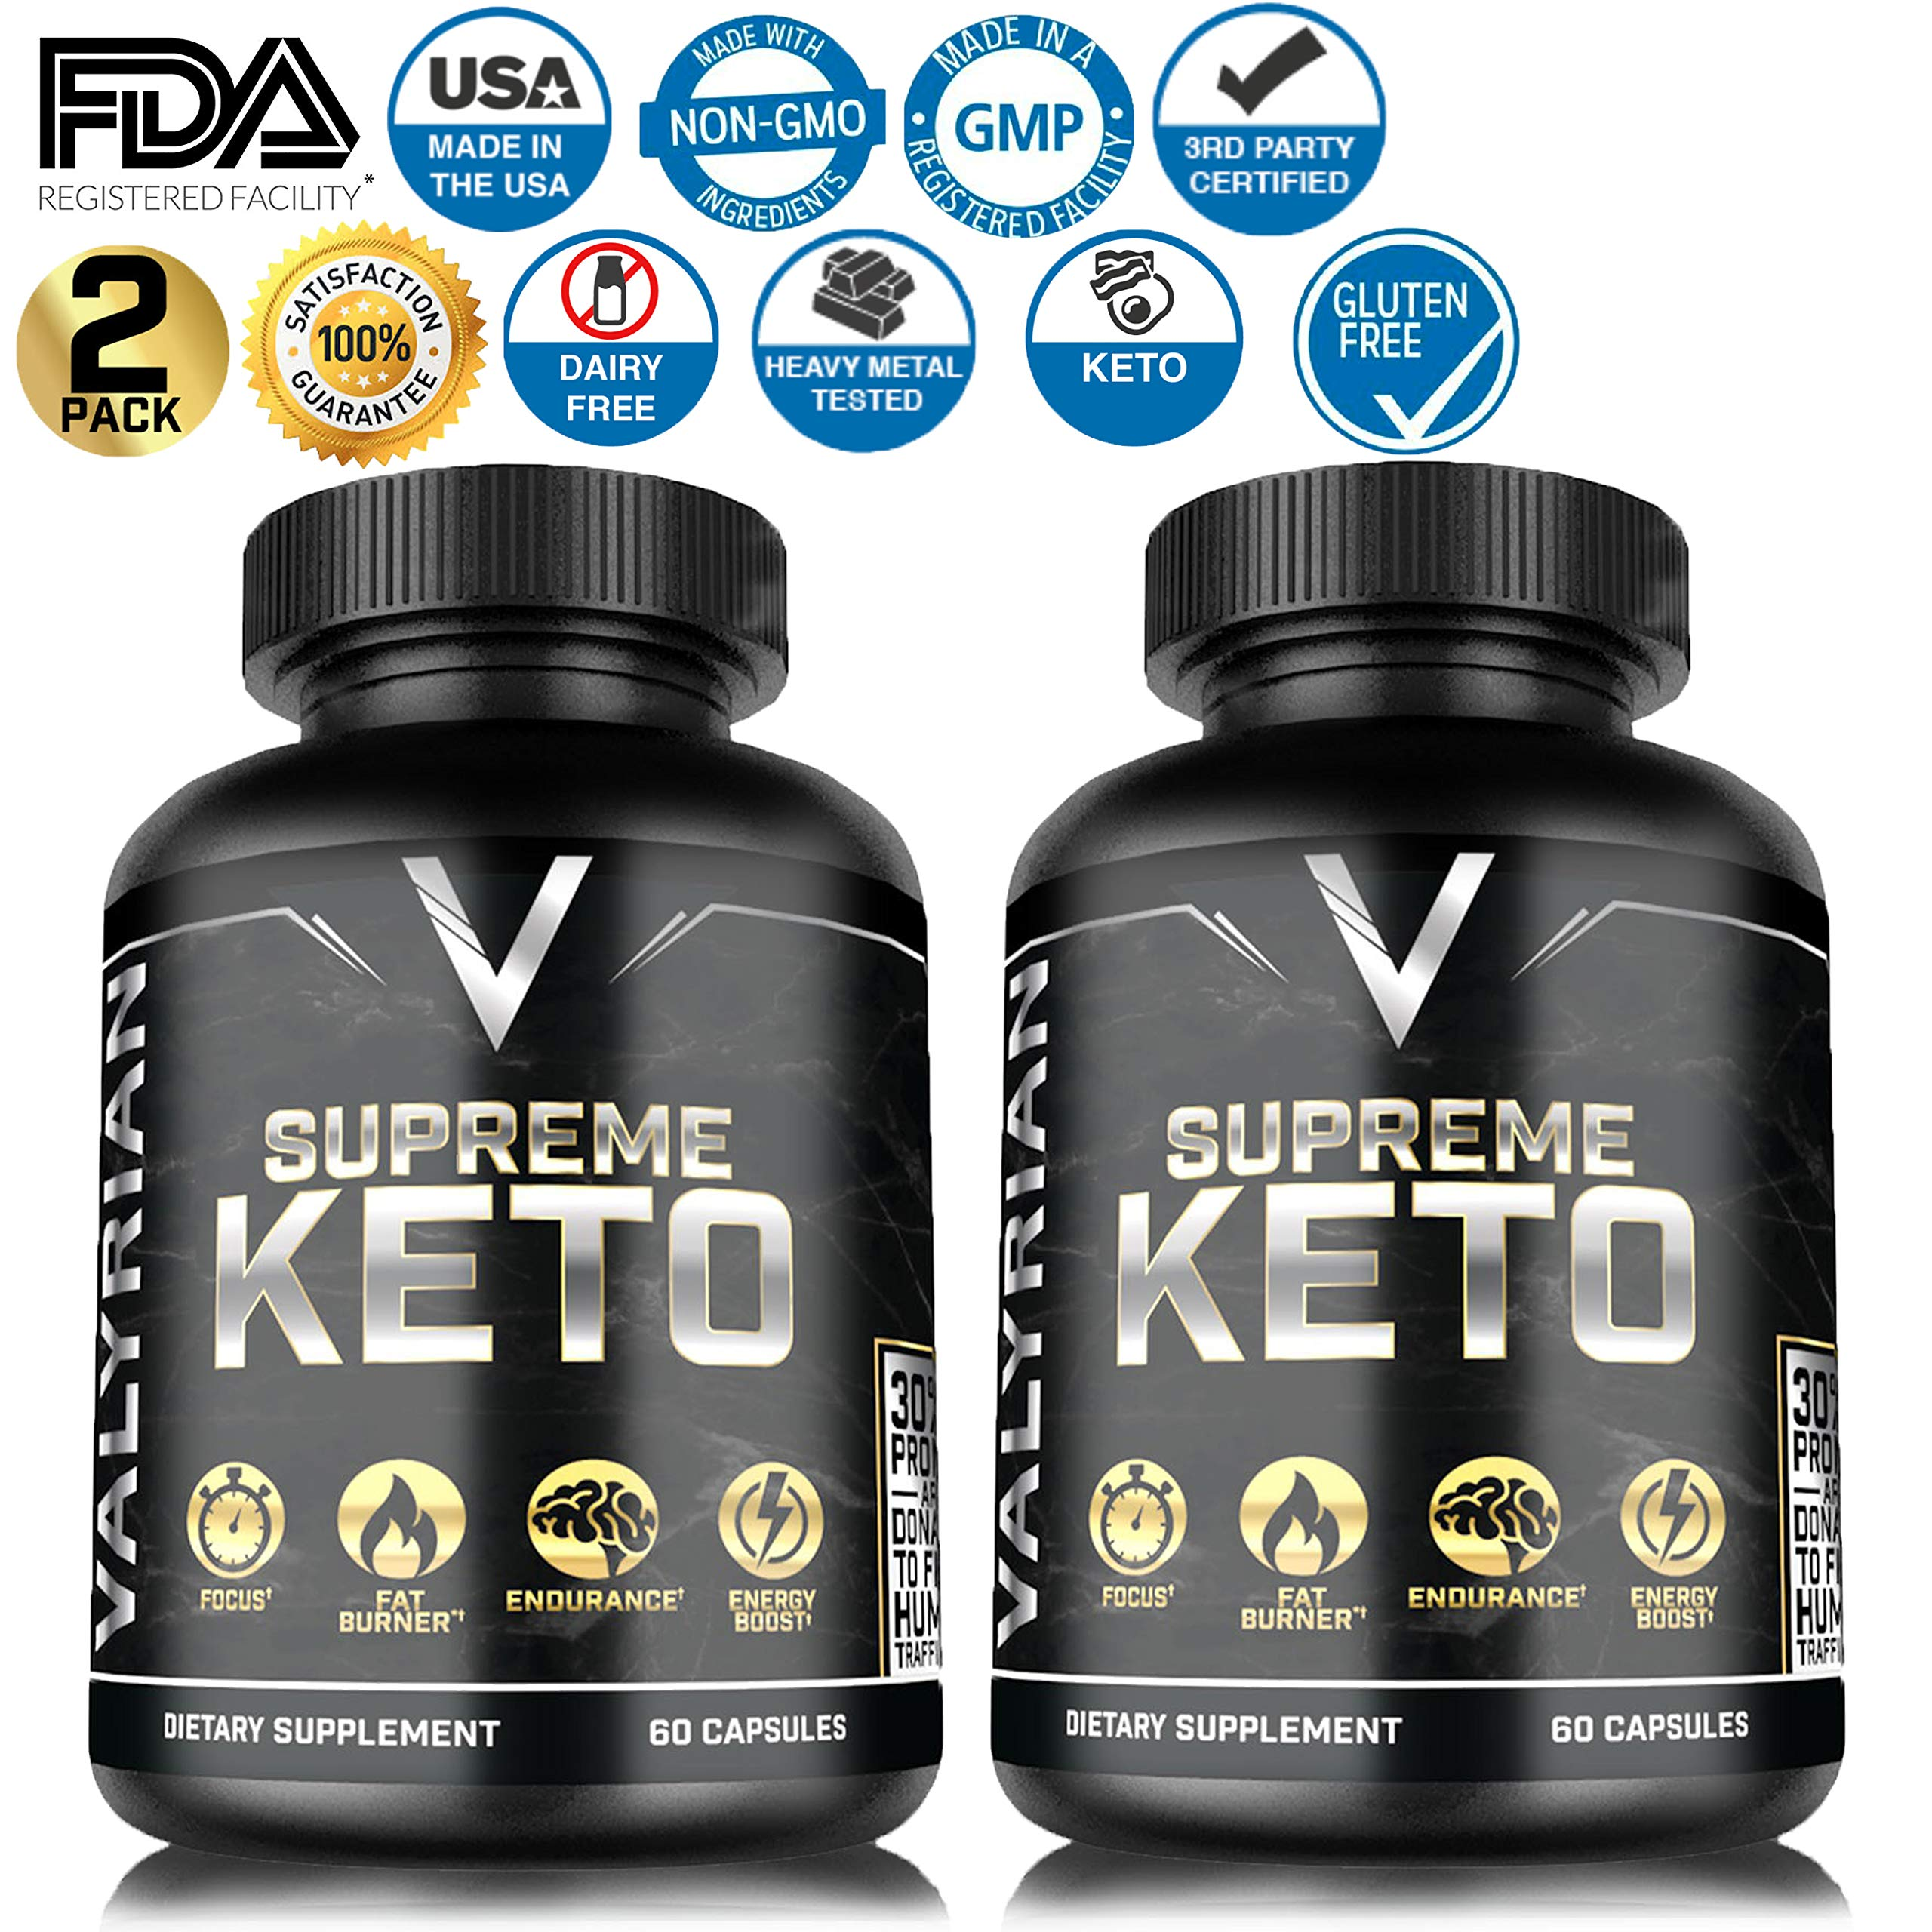 2 Pack Keto Pills - Ketogenic Burner - for Women & Men - Promotes Healthy Energy Levels - Appetite Suppressant - Carb Blocker - Keto Platinum - 60 Capsules - Keto Burn 800 mg Weight Management Pills